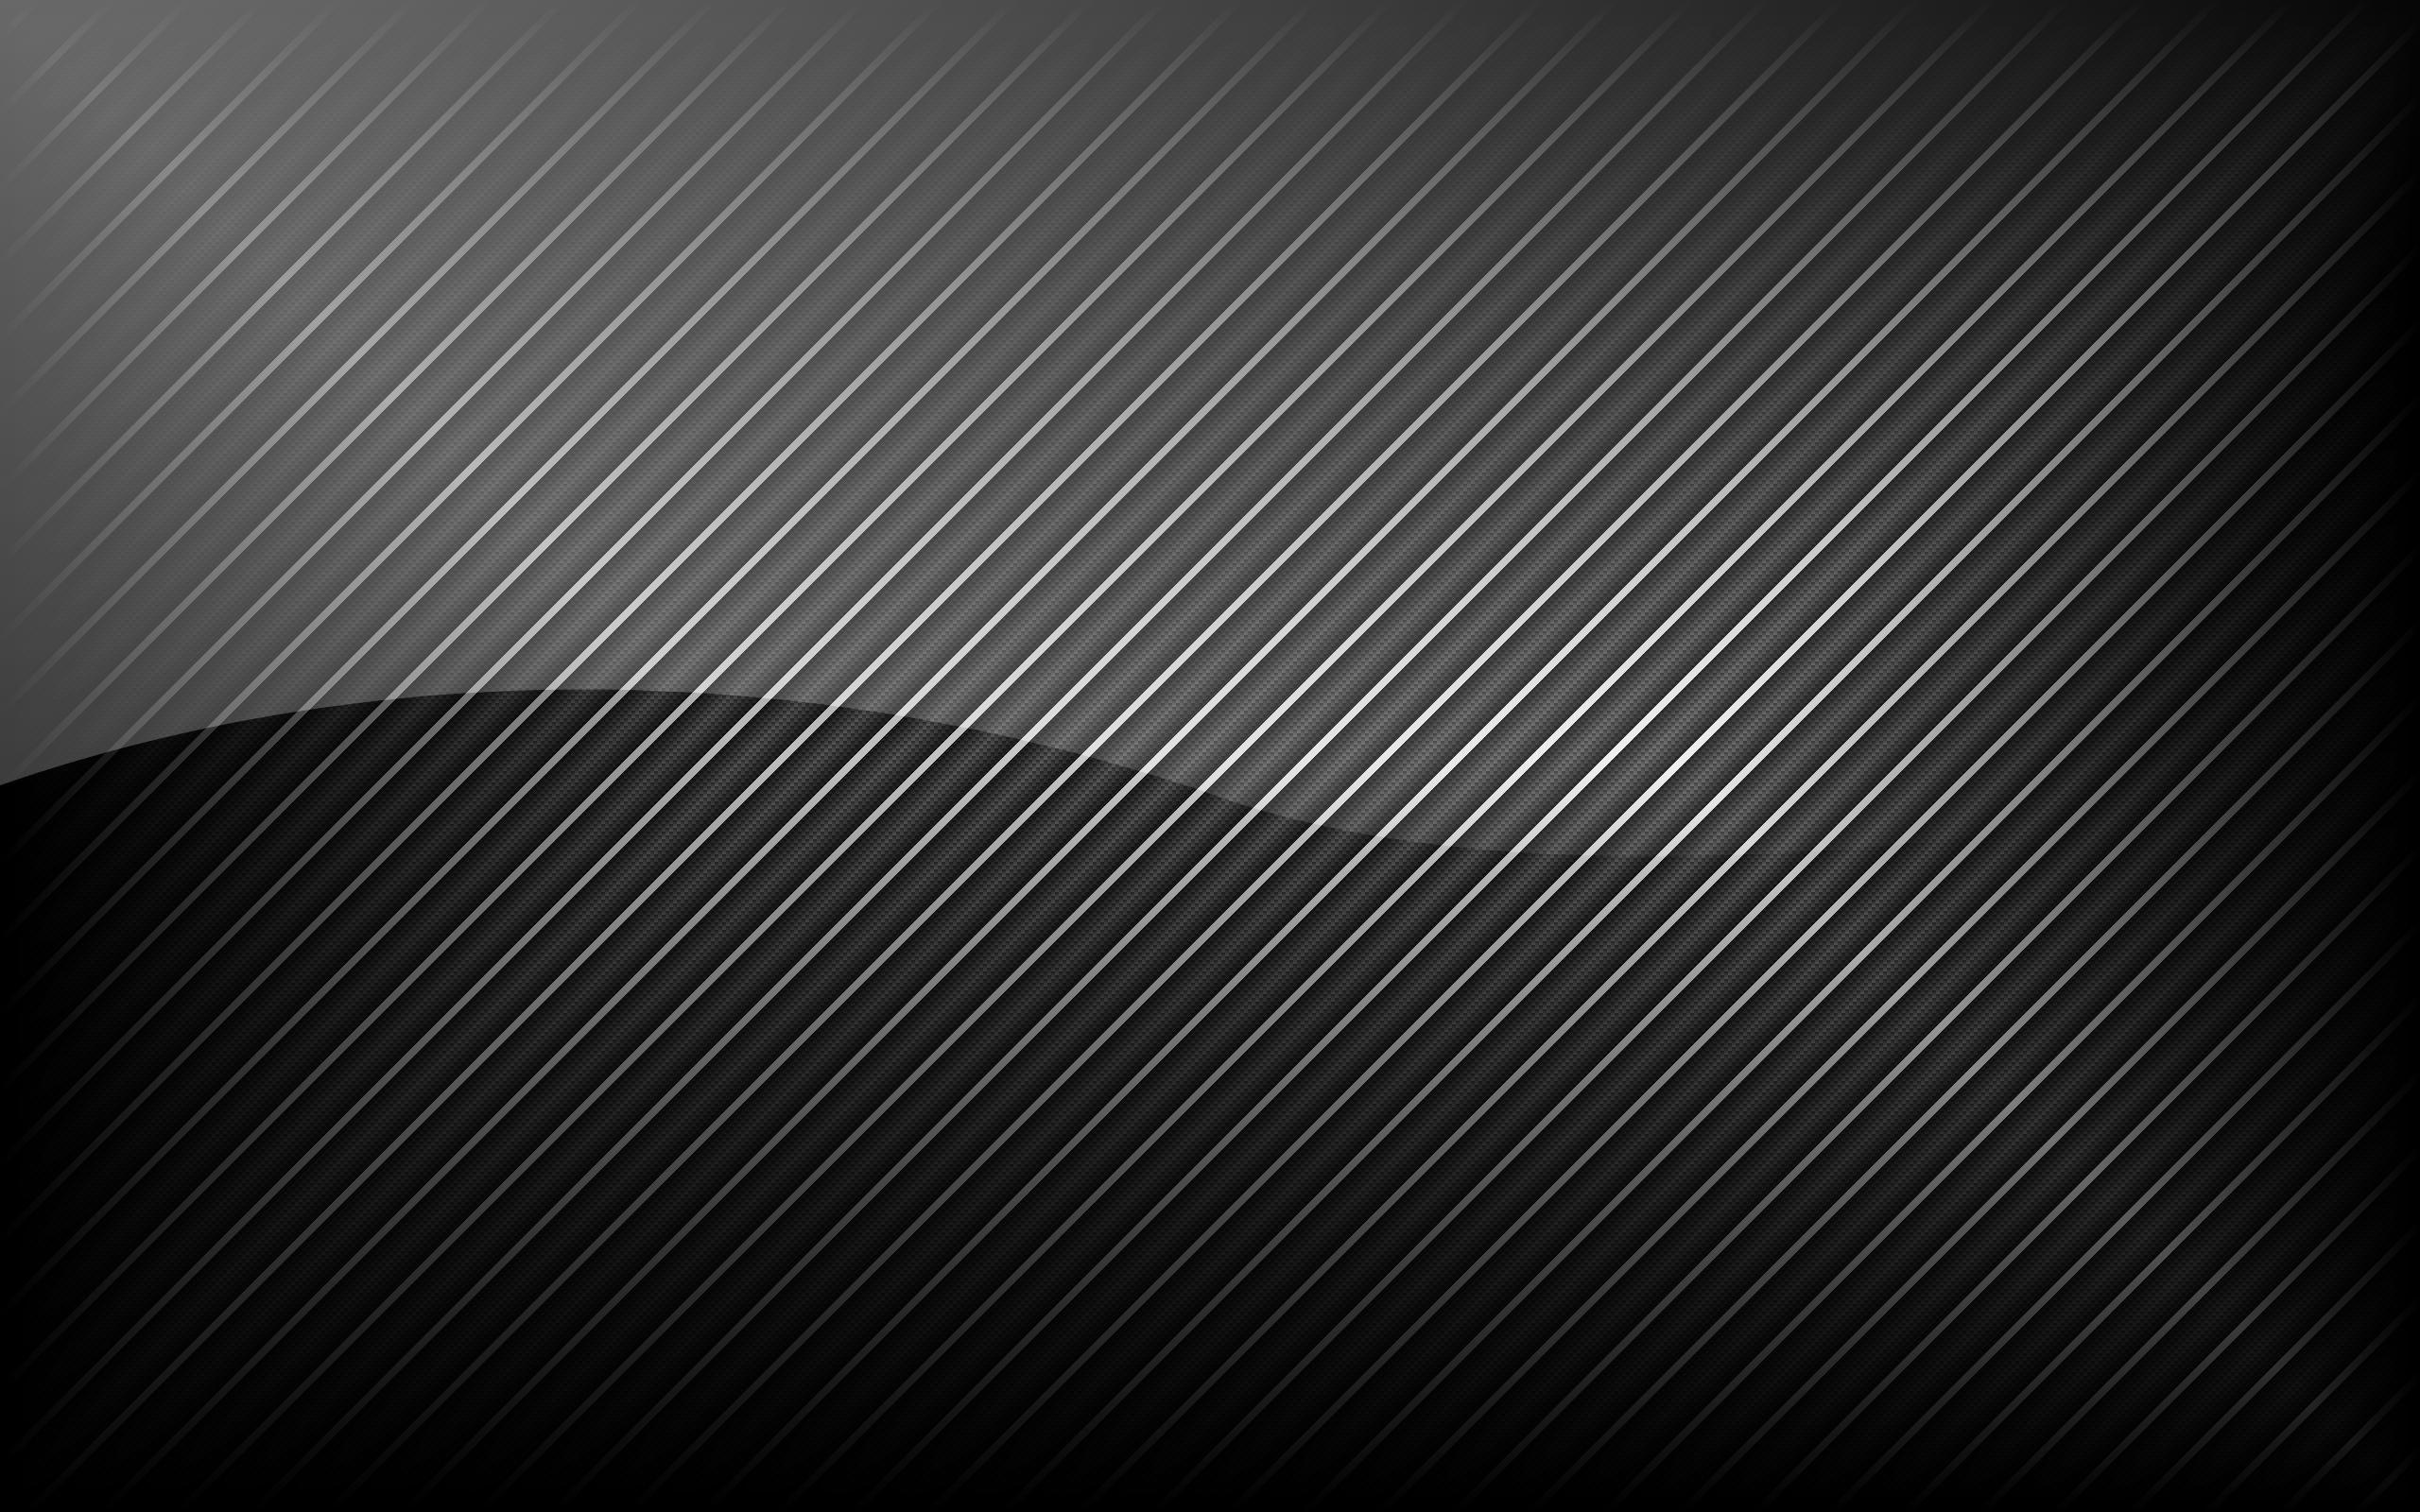 Res: 2560x1600, Carbon Fibre Wallpaper 1920X1080 - 3D Light - 10 of 10 | 3d light, Wallpaper  and High resolution wallpapers